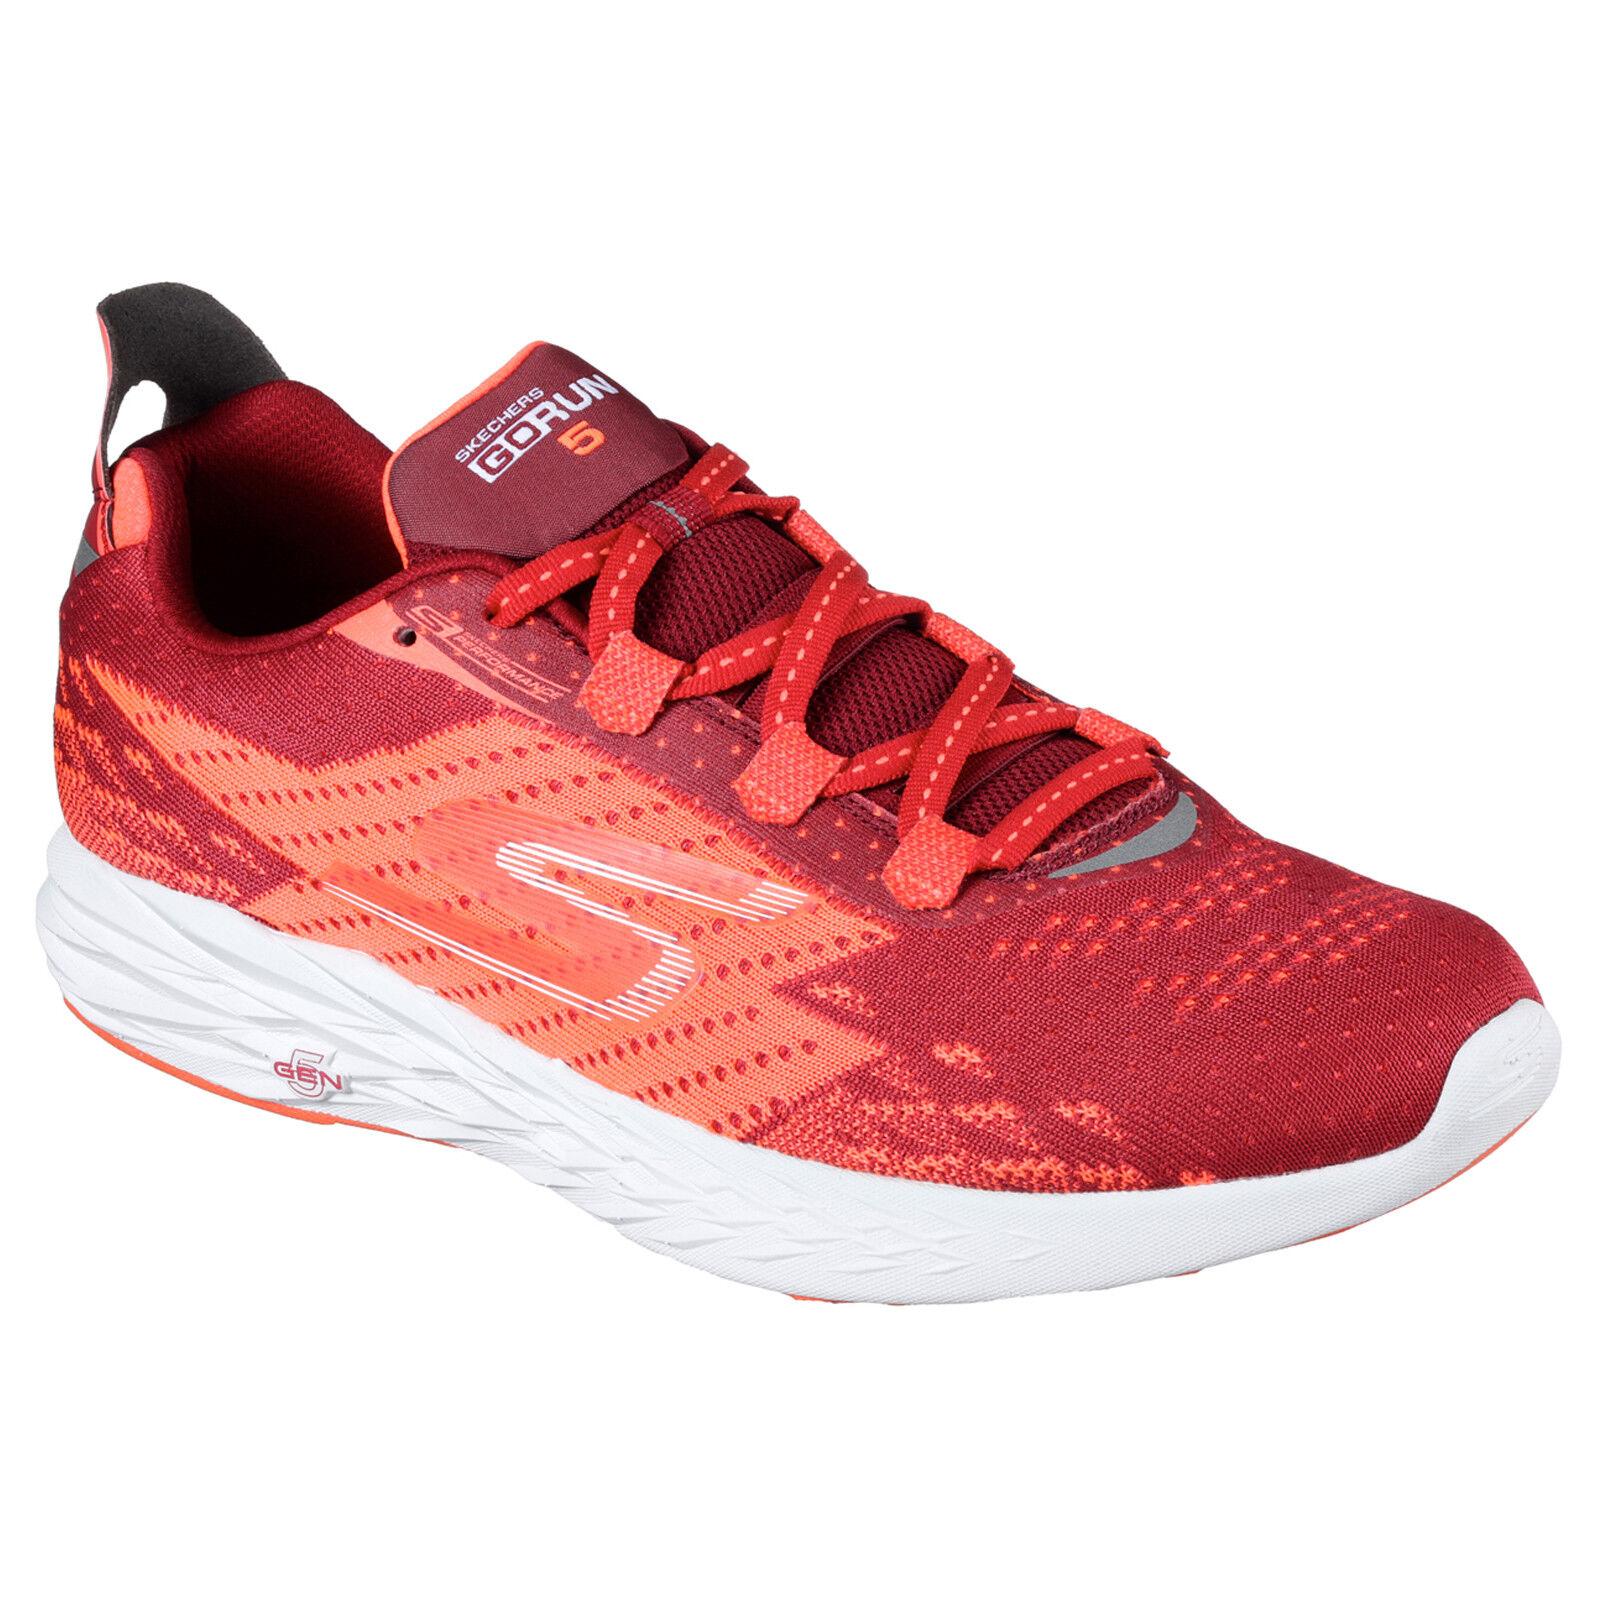 Skechers GoRun 5 Trainers Mens Sports Running Memory Foam Training shoes